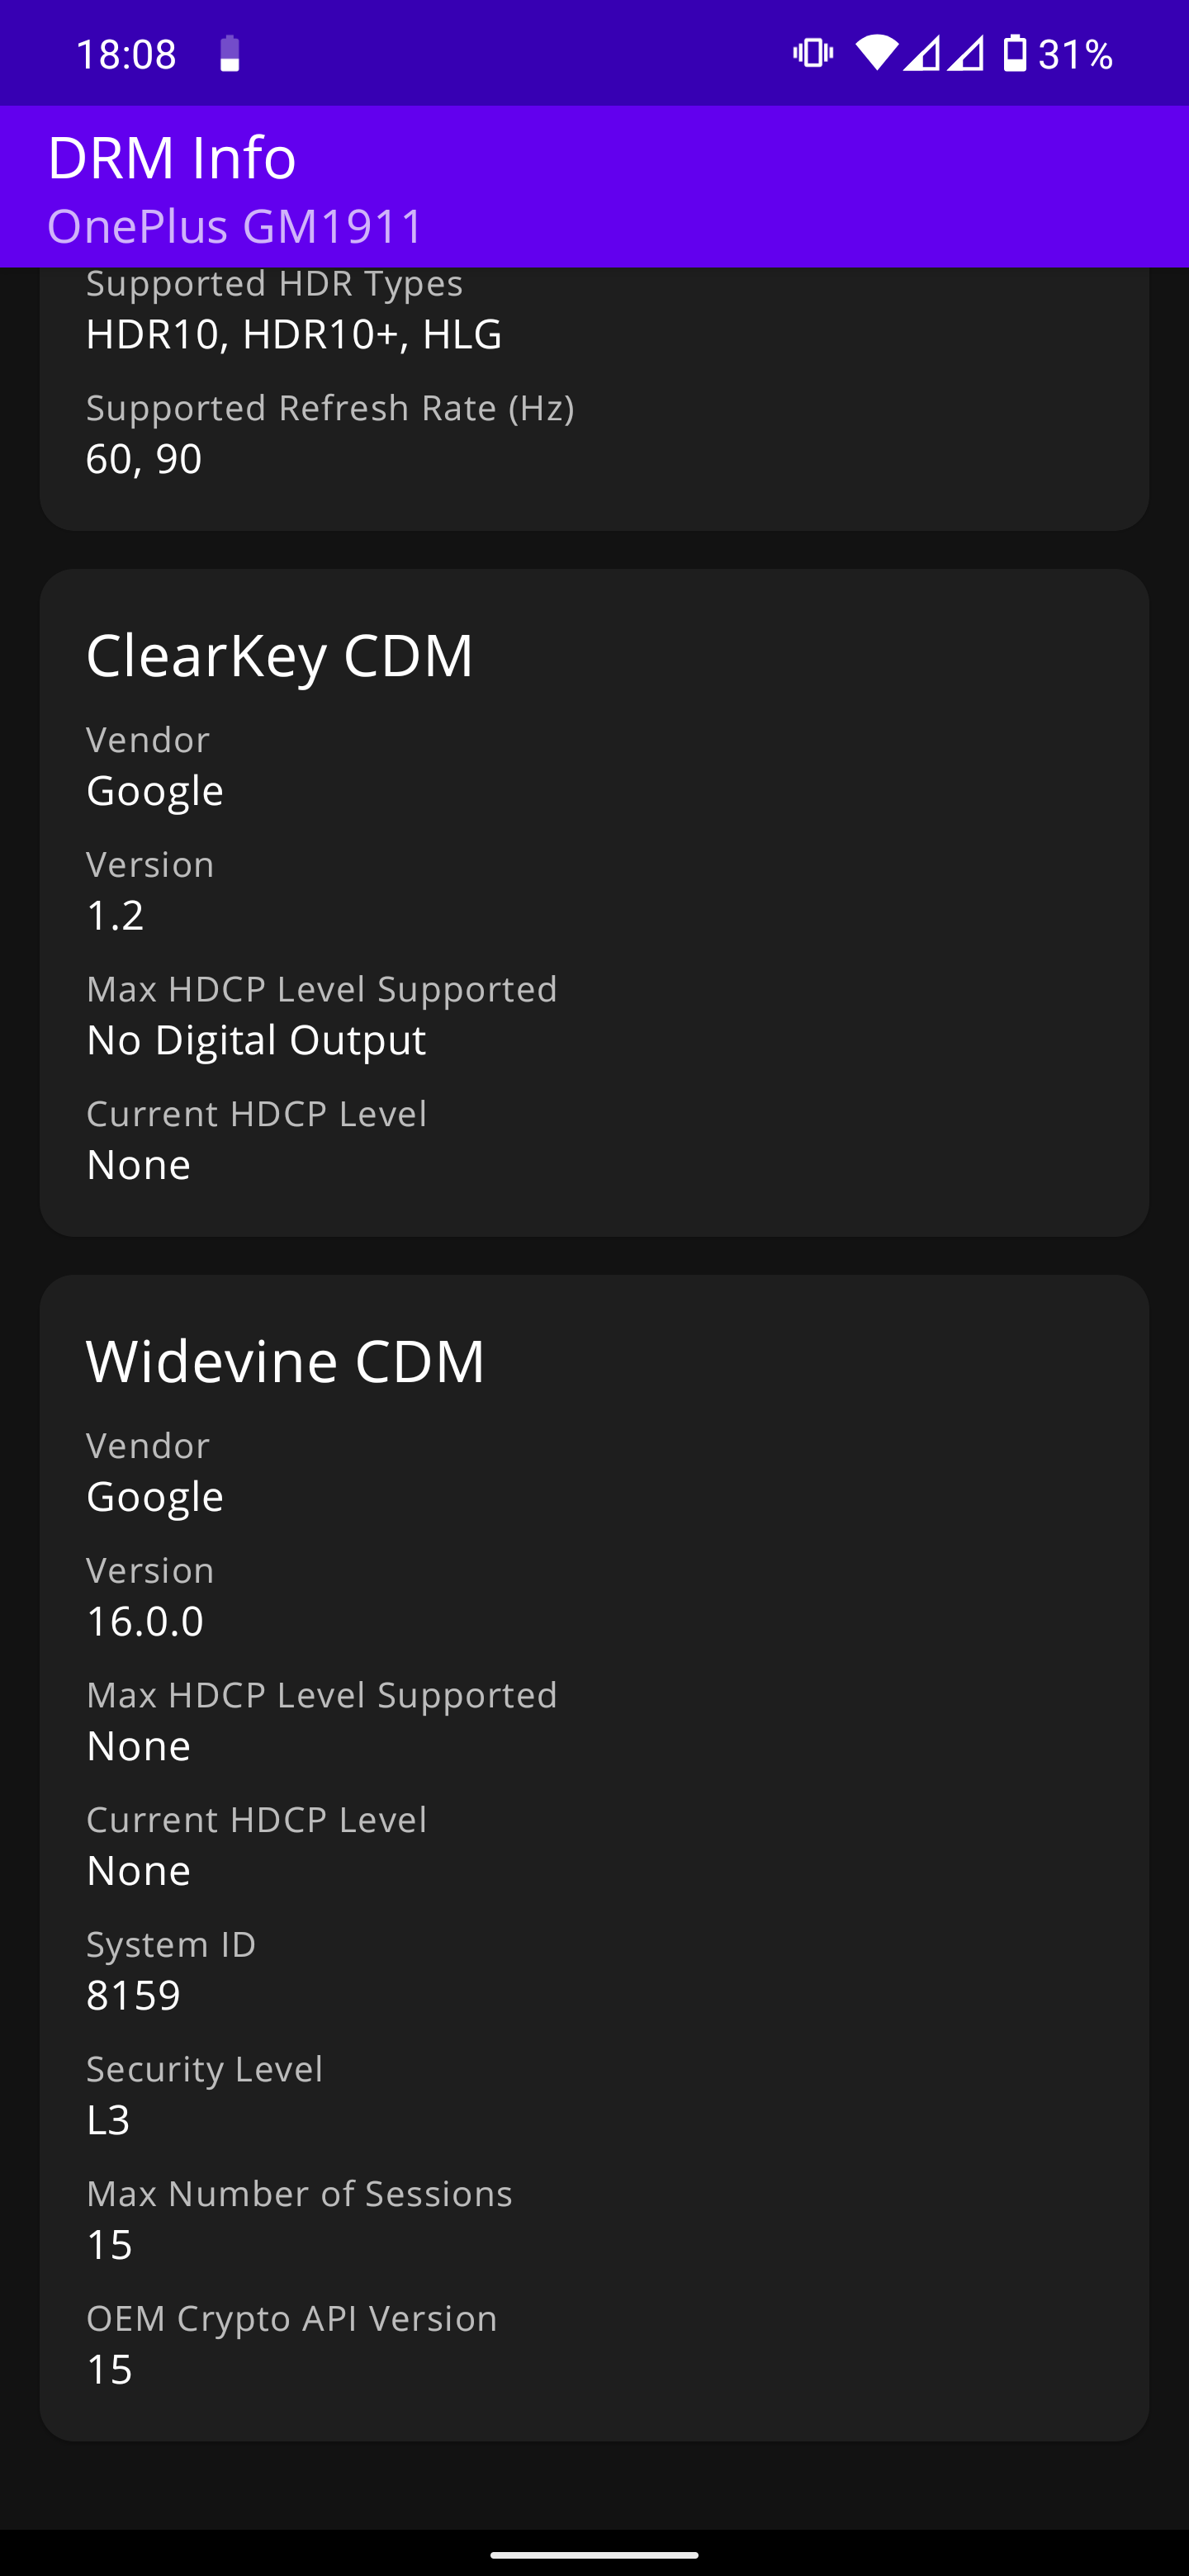 Screenshot_20210820-180837_DRM_Info.png